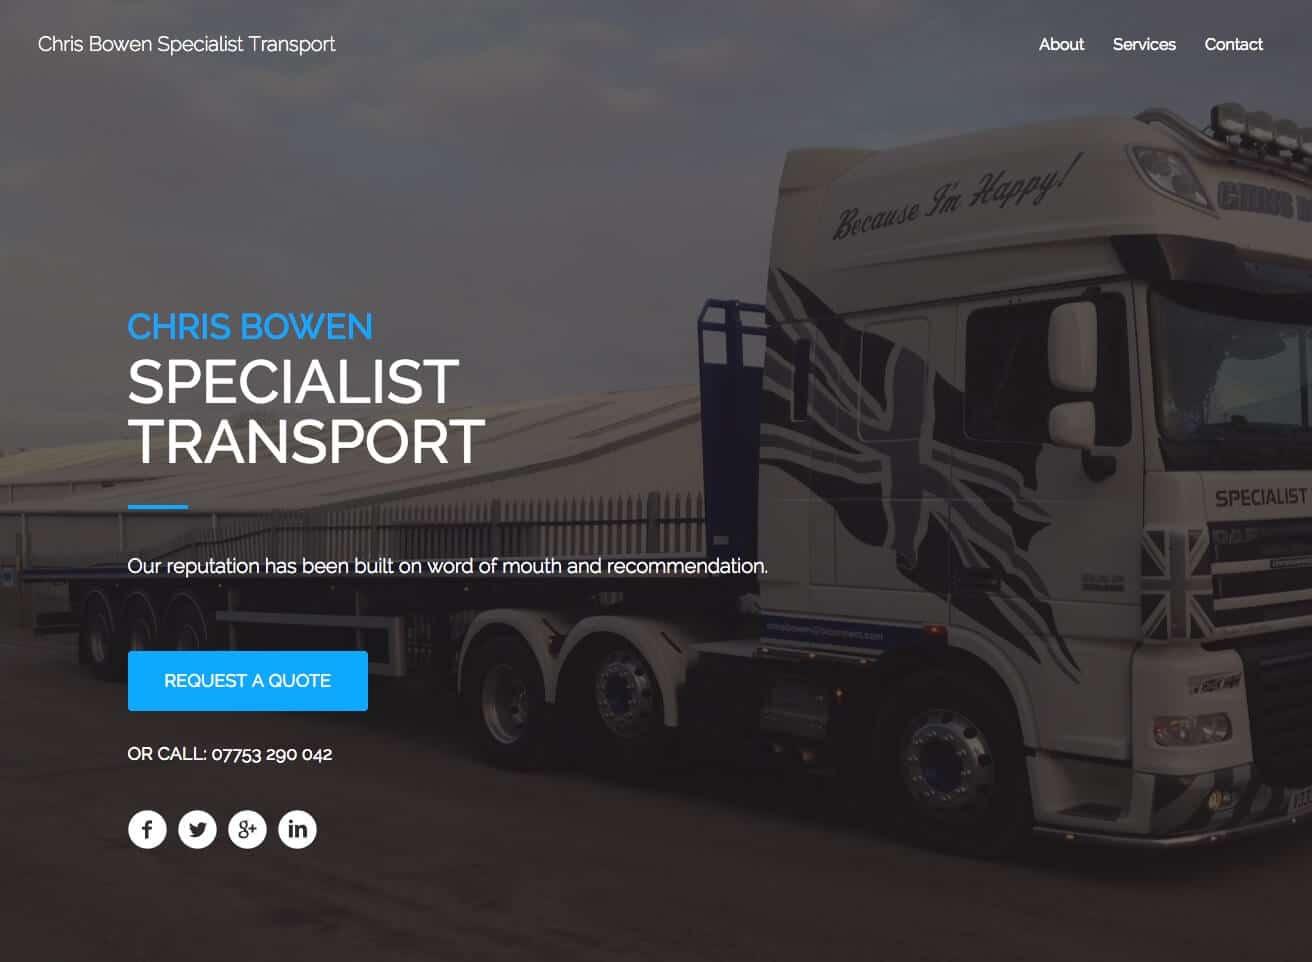 Chris Bowen Transport